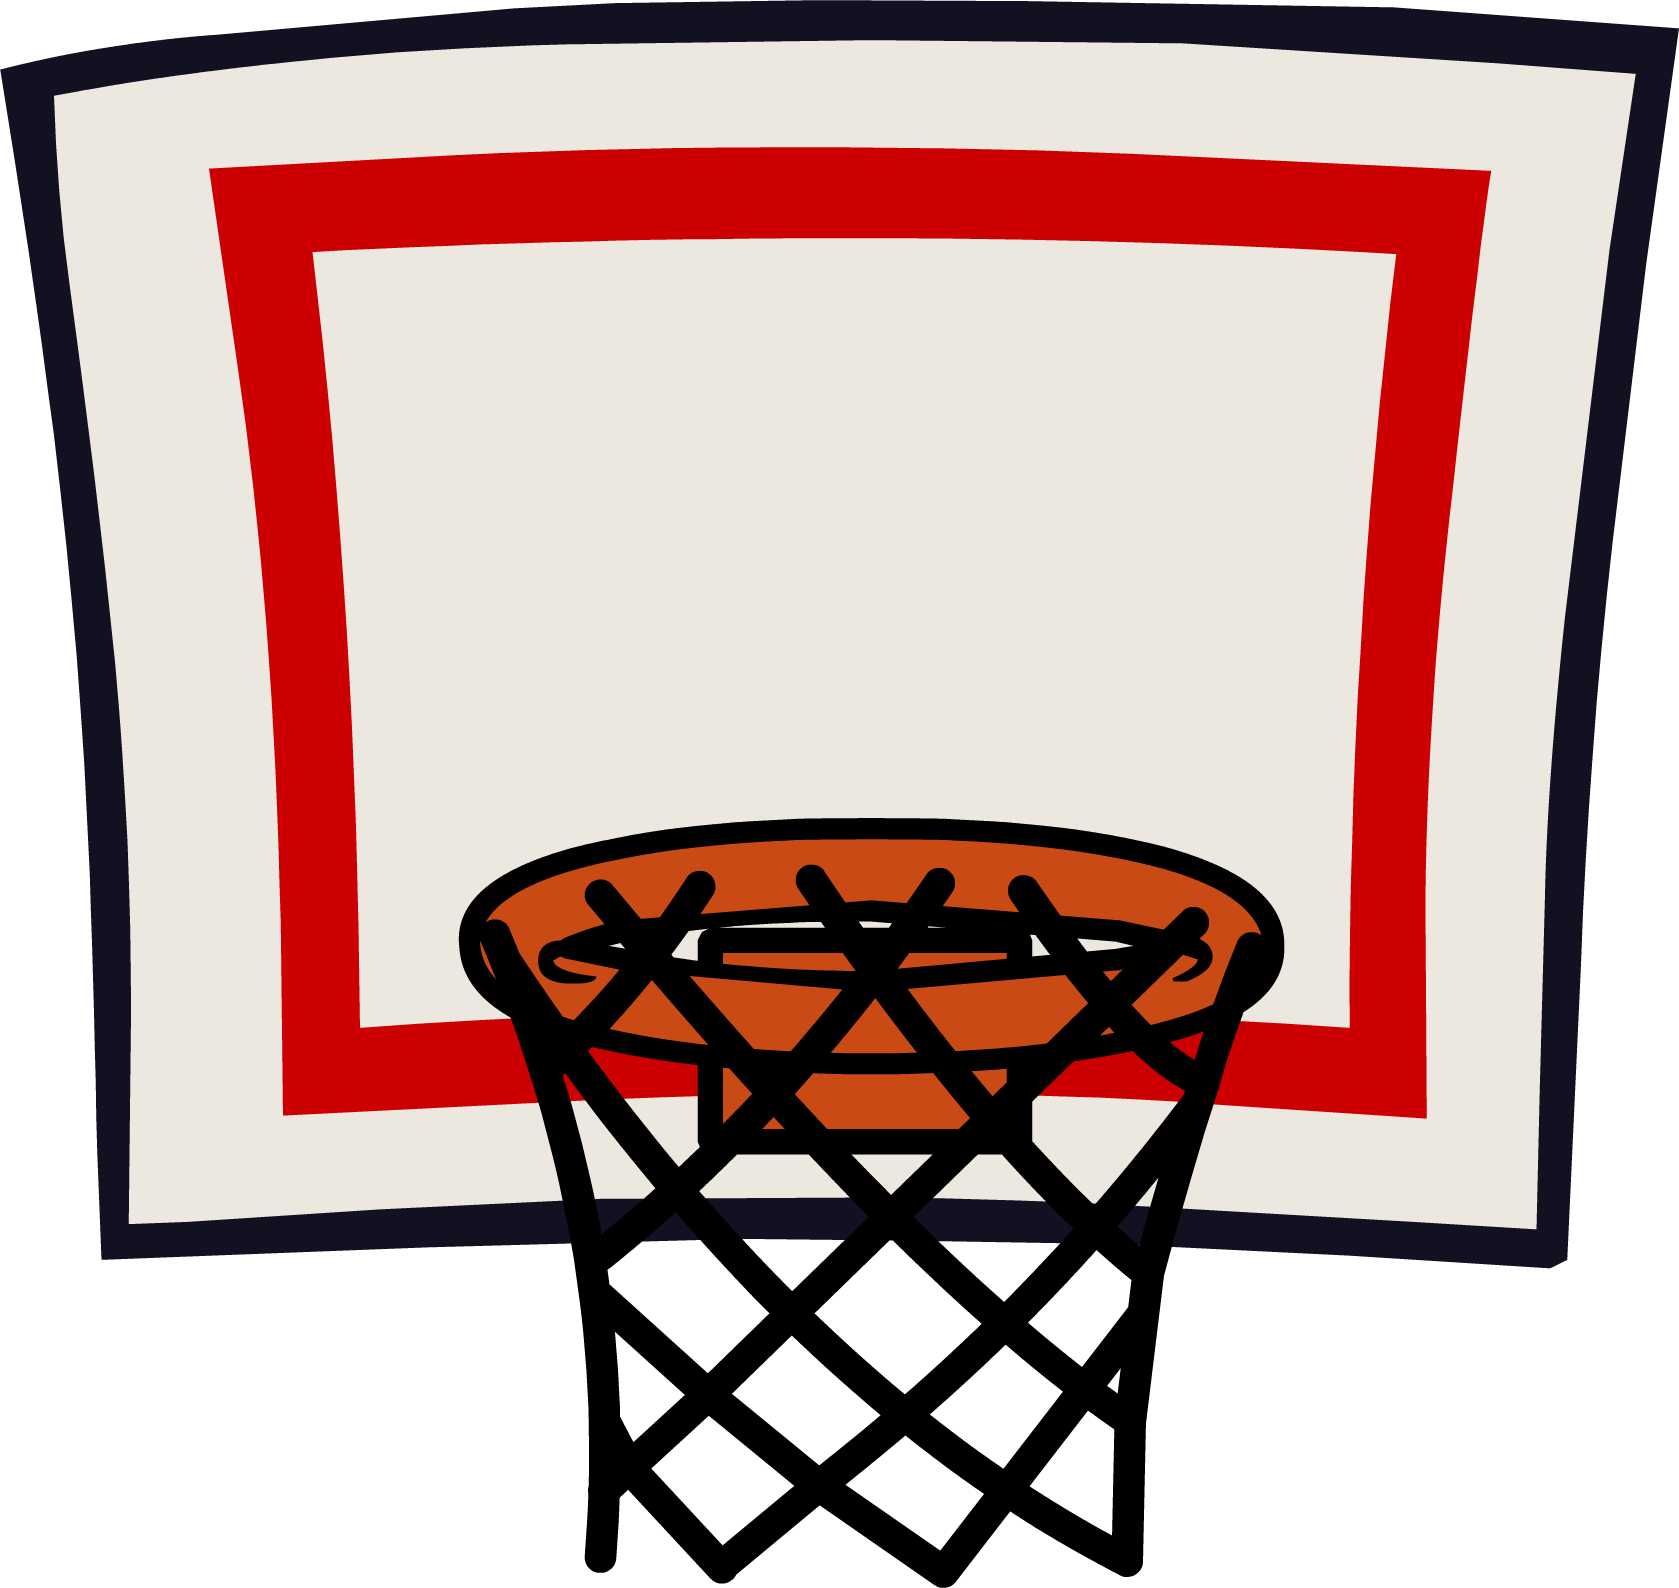 Basketball Net.PNG - Basketball Net PNG HD